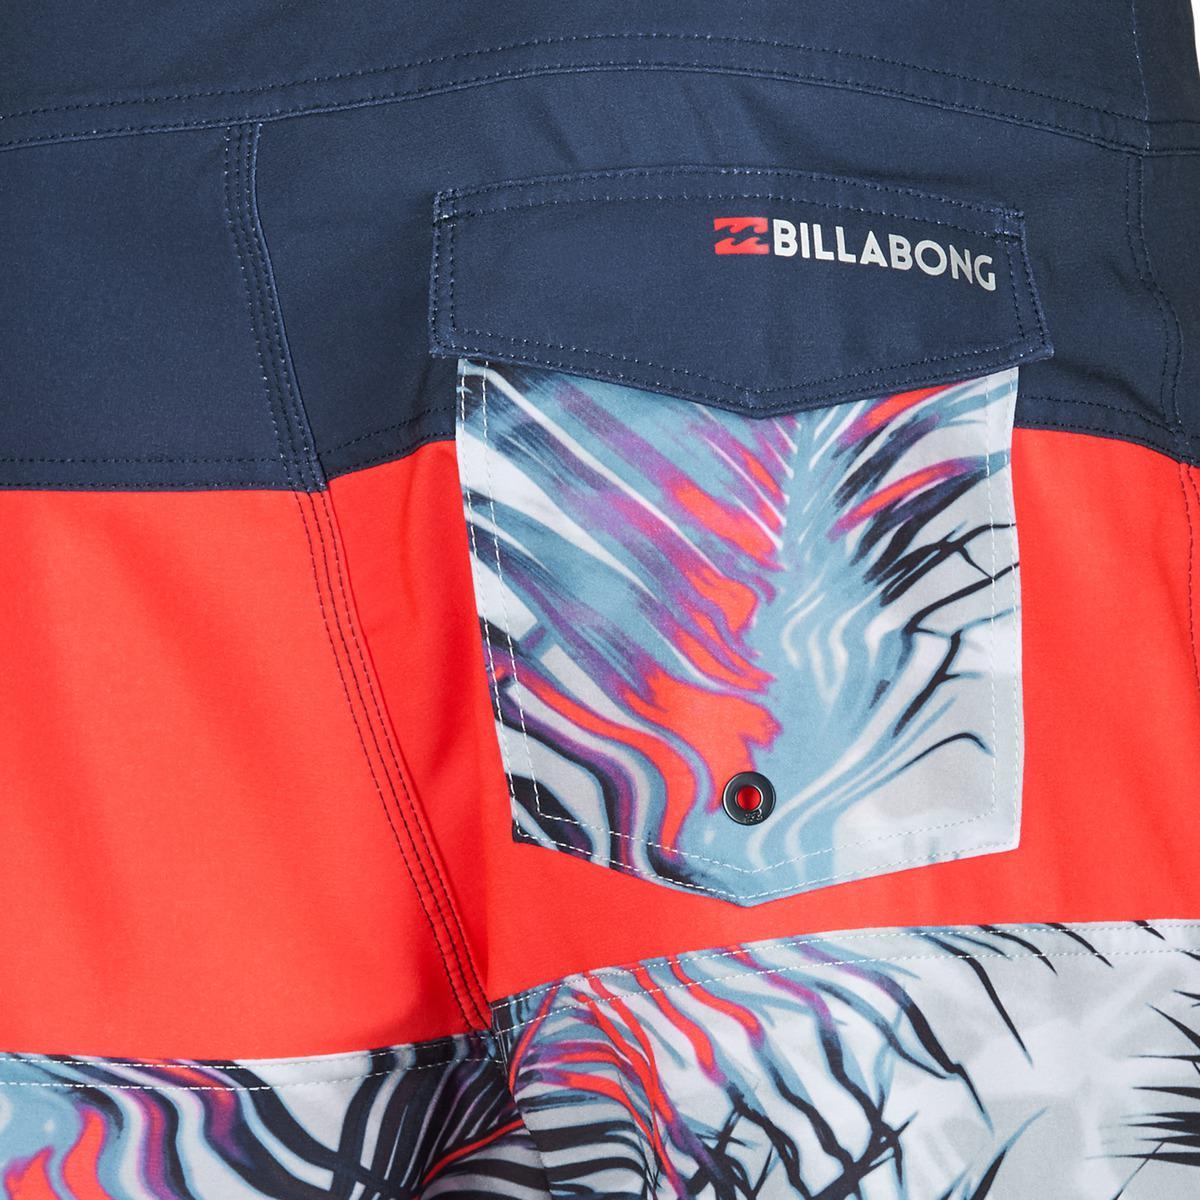 Billabong Tribong X Fronds 18 Men s In Multicolour for Men - Lyst 9ad3e792106